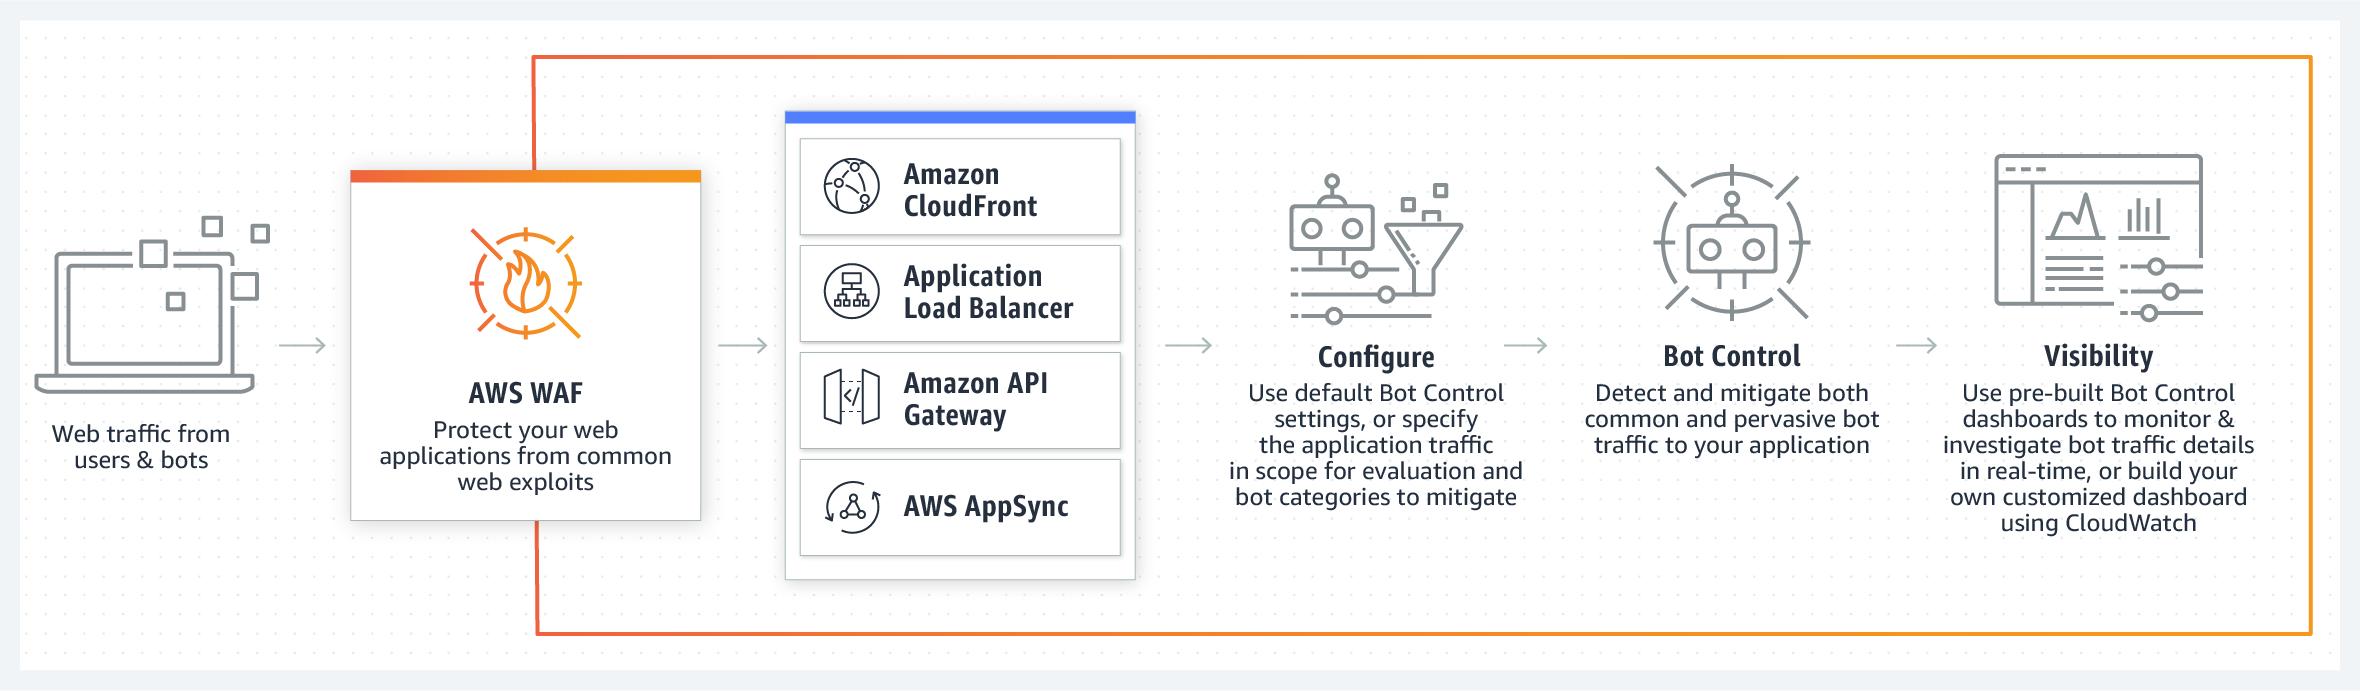 Amazon Web Services AWS WAF Bot Control